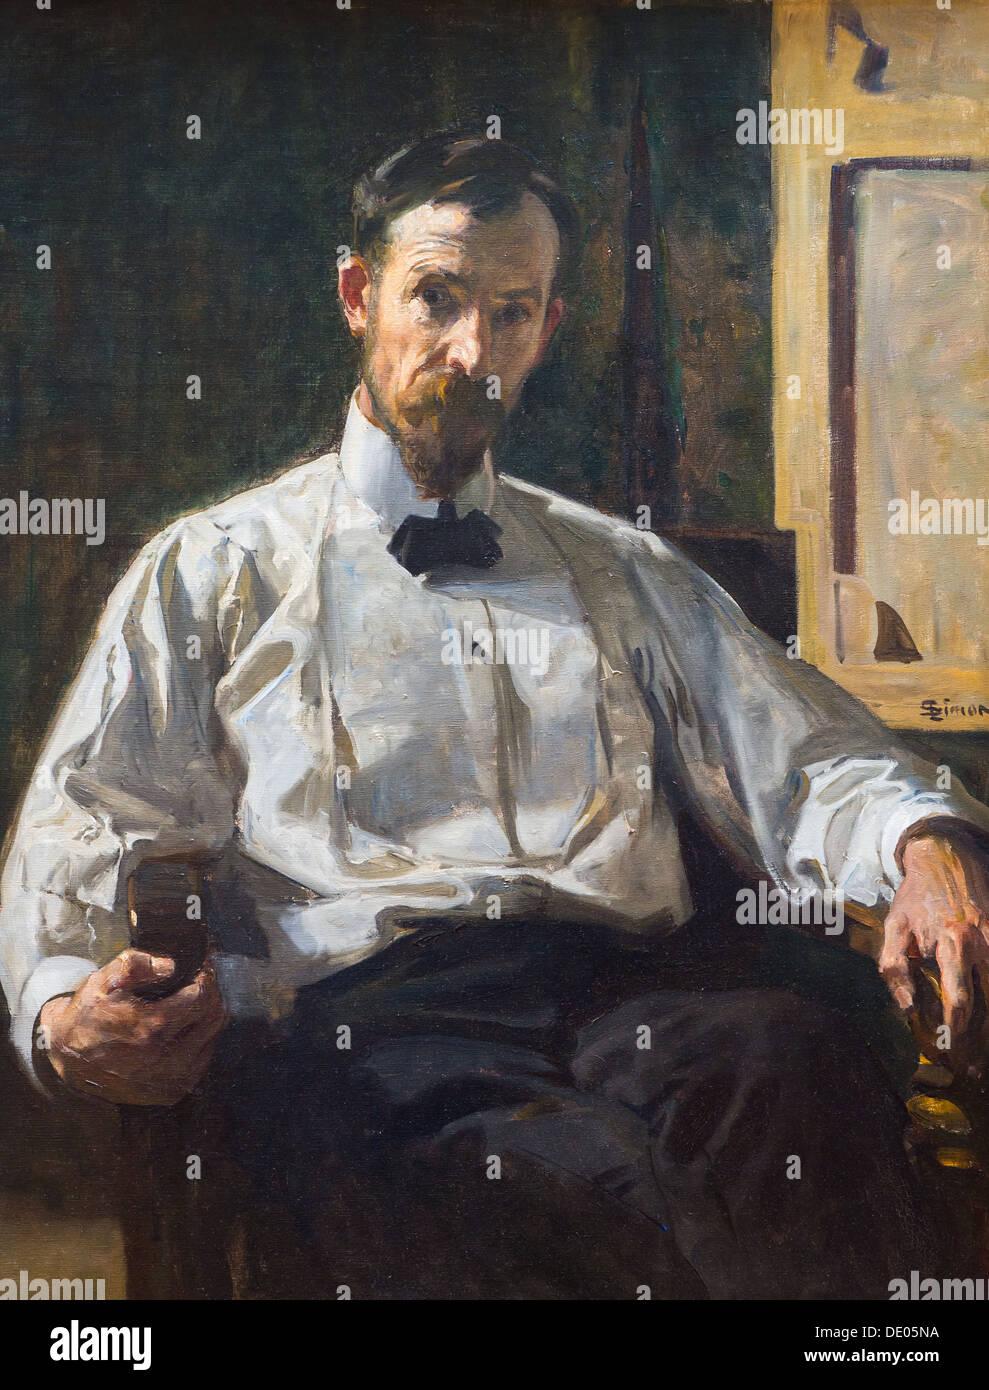 20th century  -  Self-Portrait, 1908 - Lucien Simon Philippe Sauvan-Magnet / Active Museum oil on canvas - Stock Image